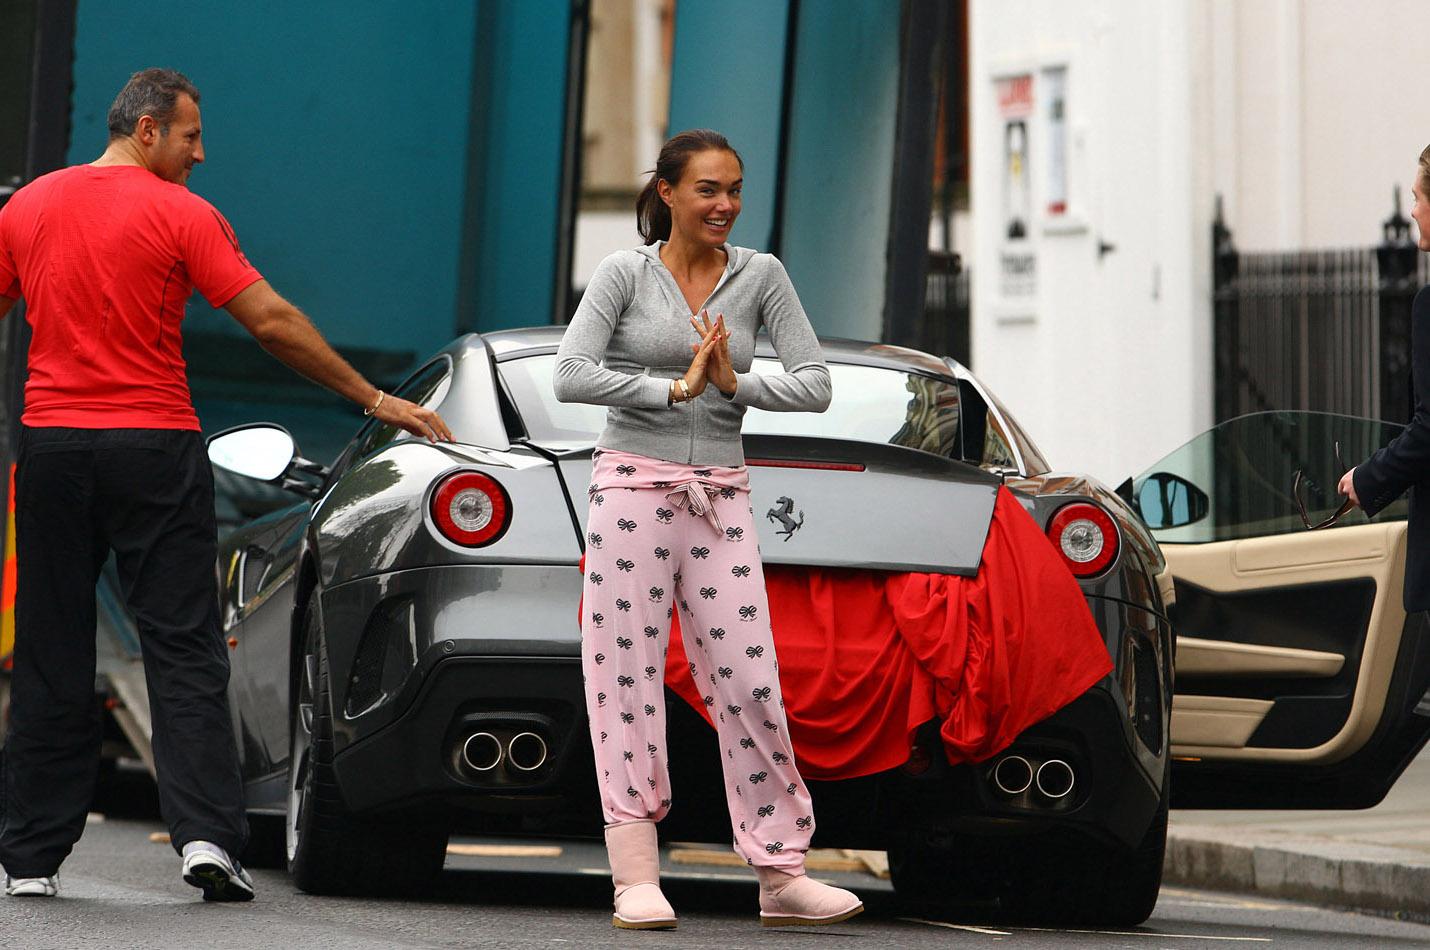 http://4.bp.blogspot.com/-iC6Cs547-8Q/TlsxJ4dbqfI/AAAAAAAAArE/MA-c51fkBaY/s1600/Tamara-Ecclestone-Ferrari-Pajamas.jpg